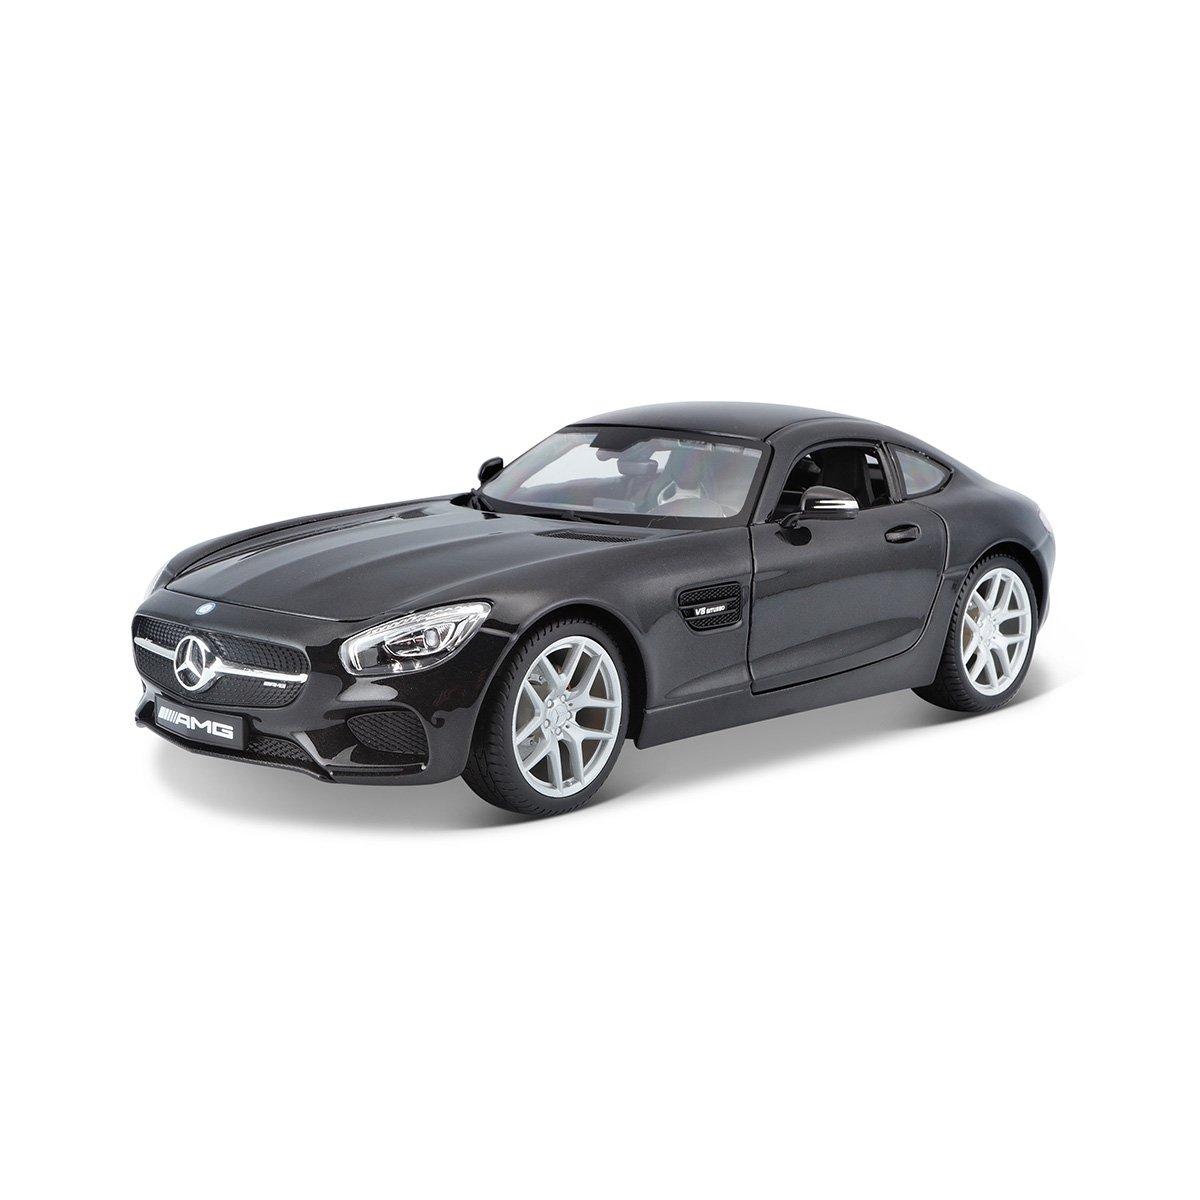 Masinuta Maisto Mercedes AMG GT, 1:18, Negru